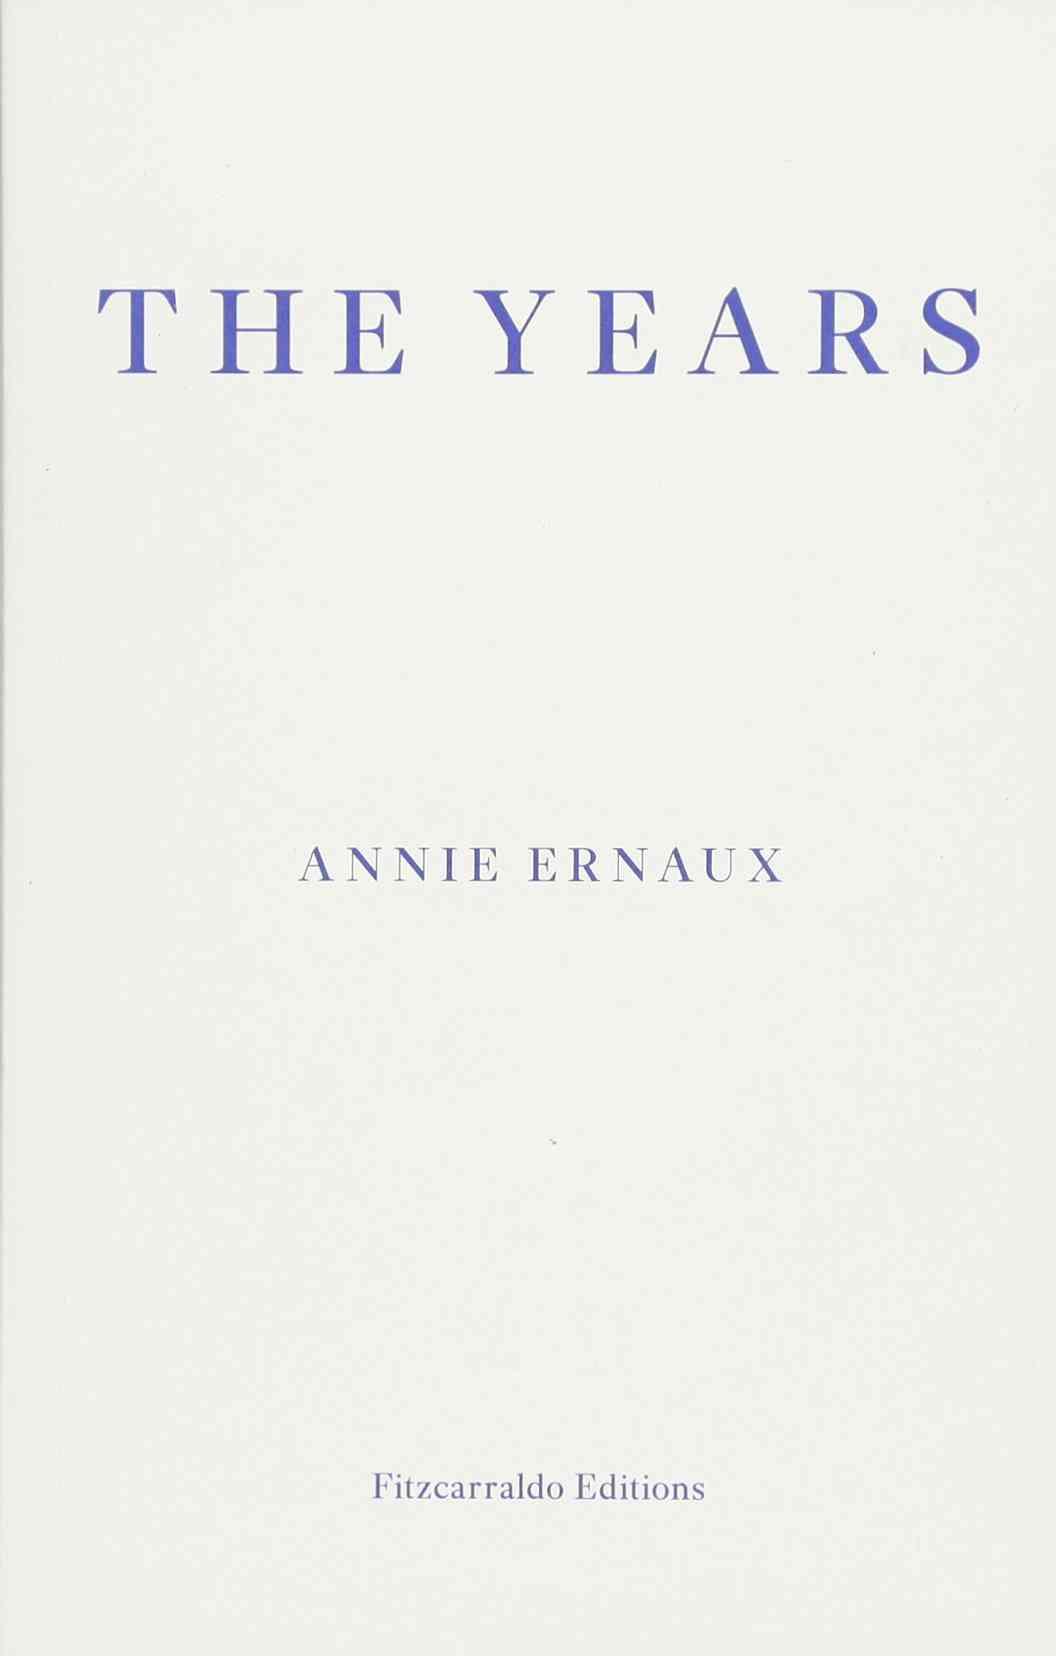 Annie Ernaux's The Years